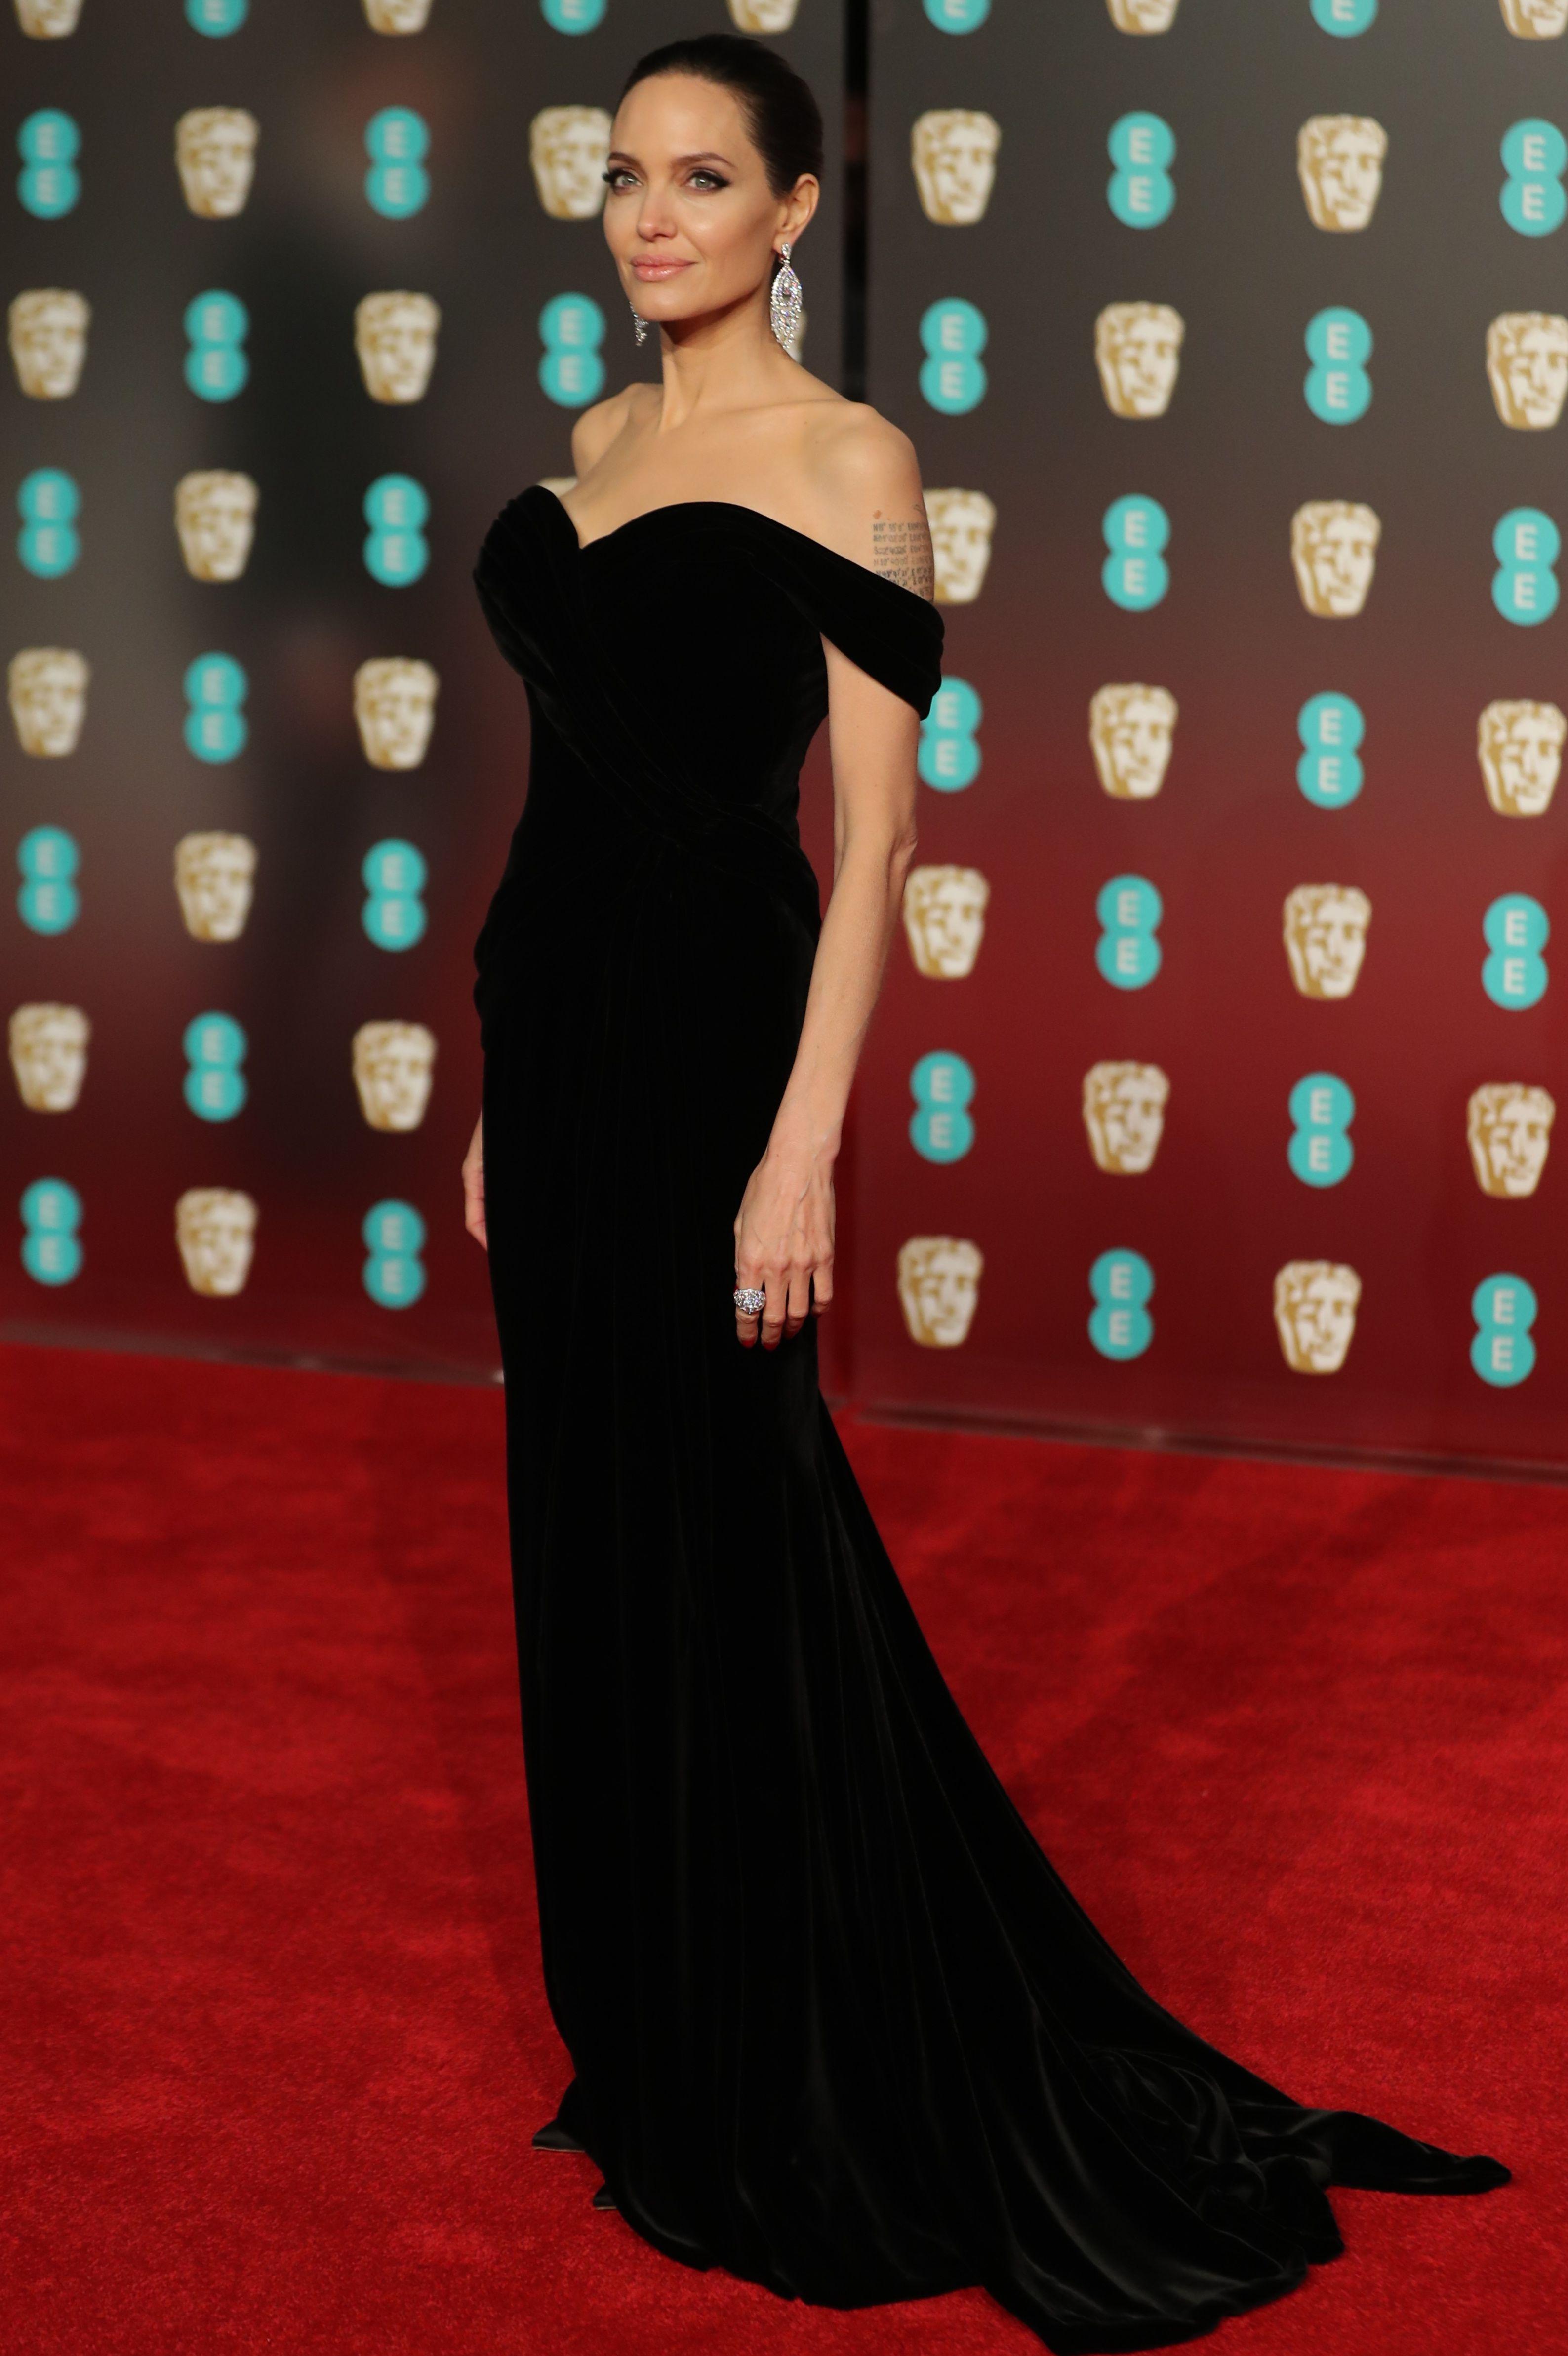 Angelina Jolie at the 2018 BAFTAs